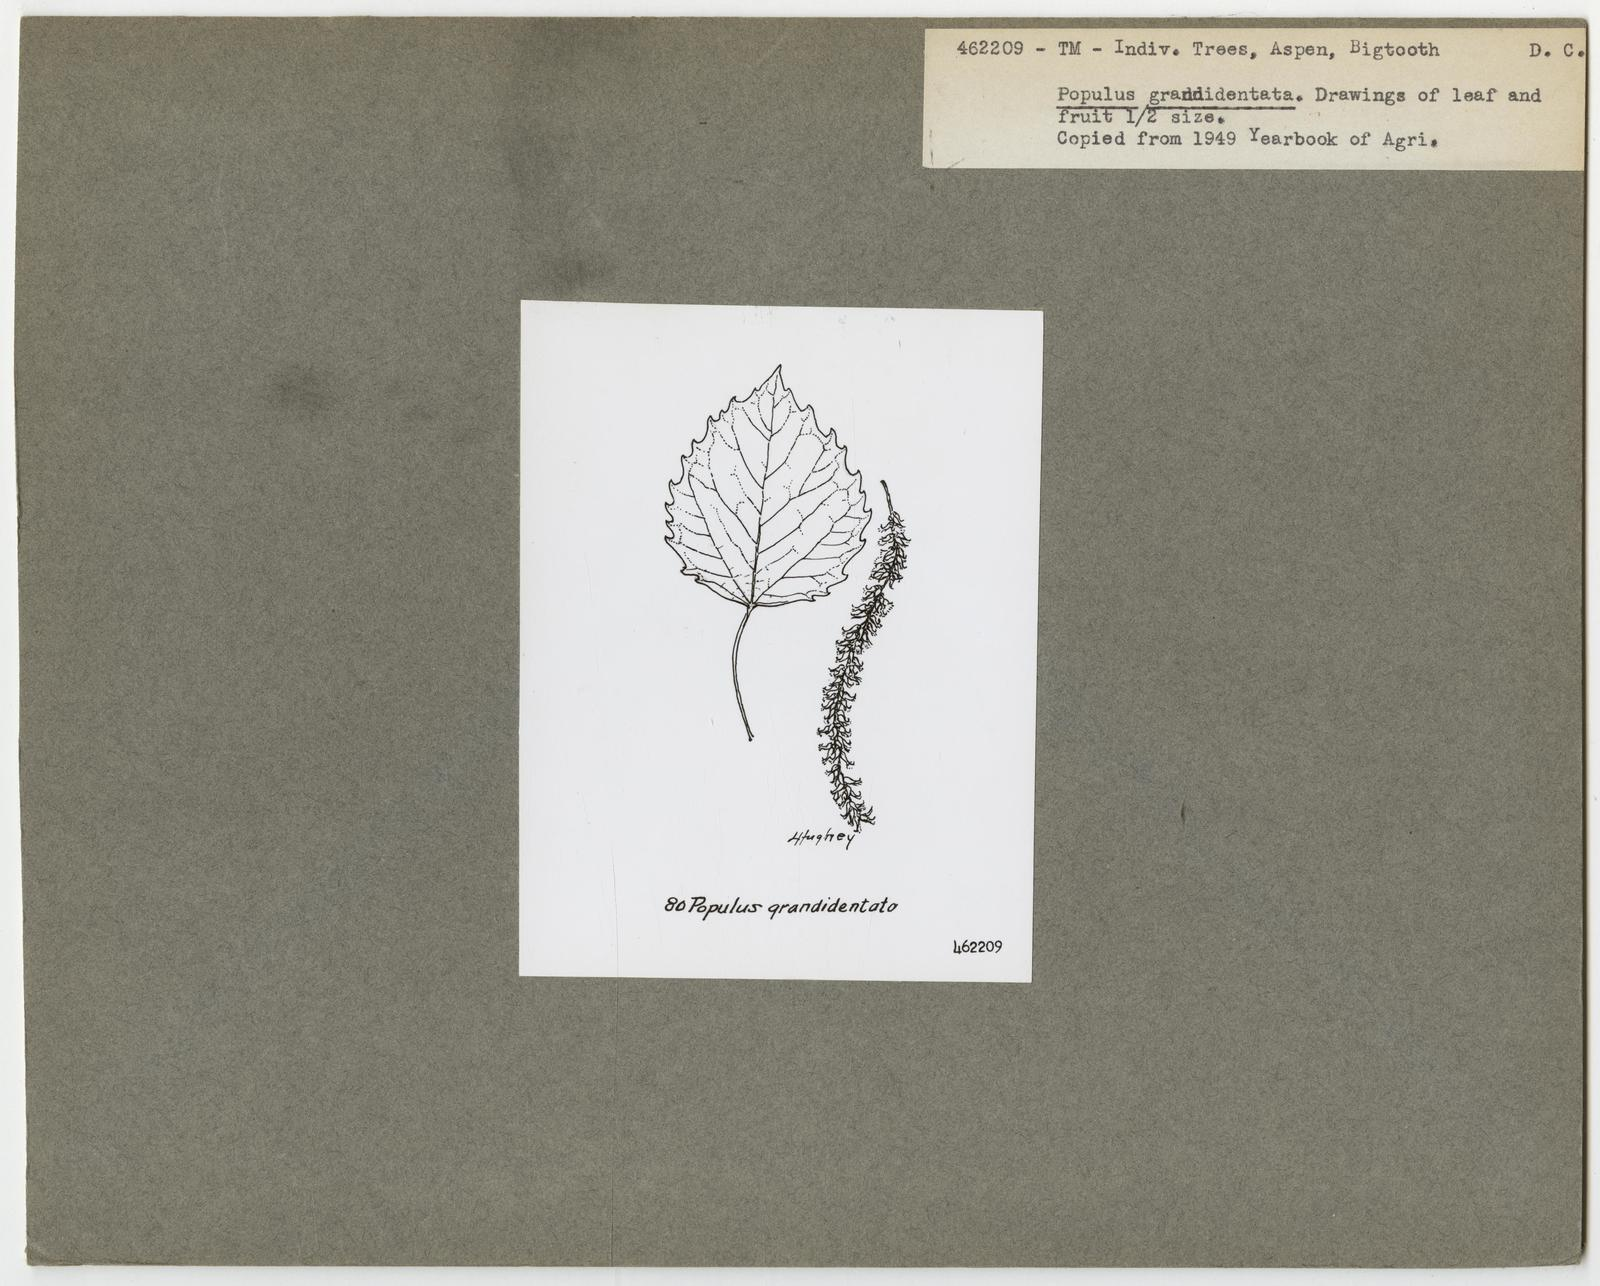 Tree Identification - Aspen